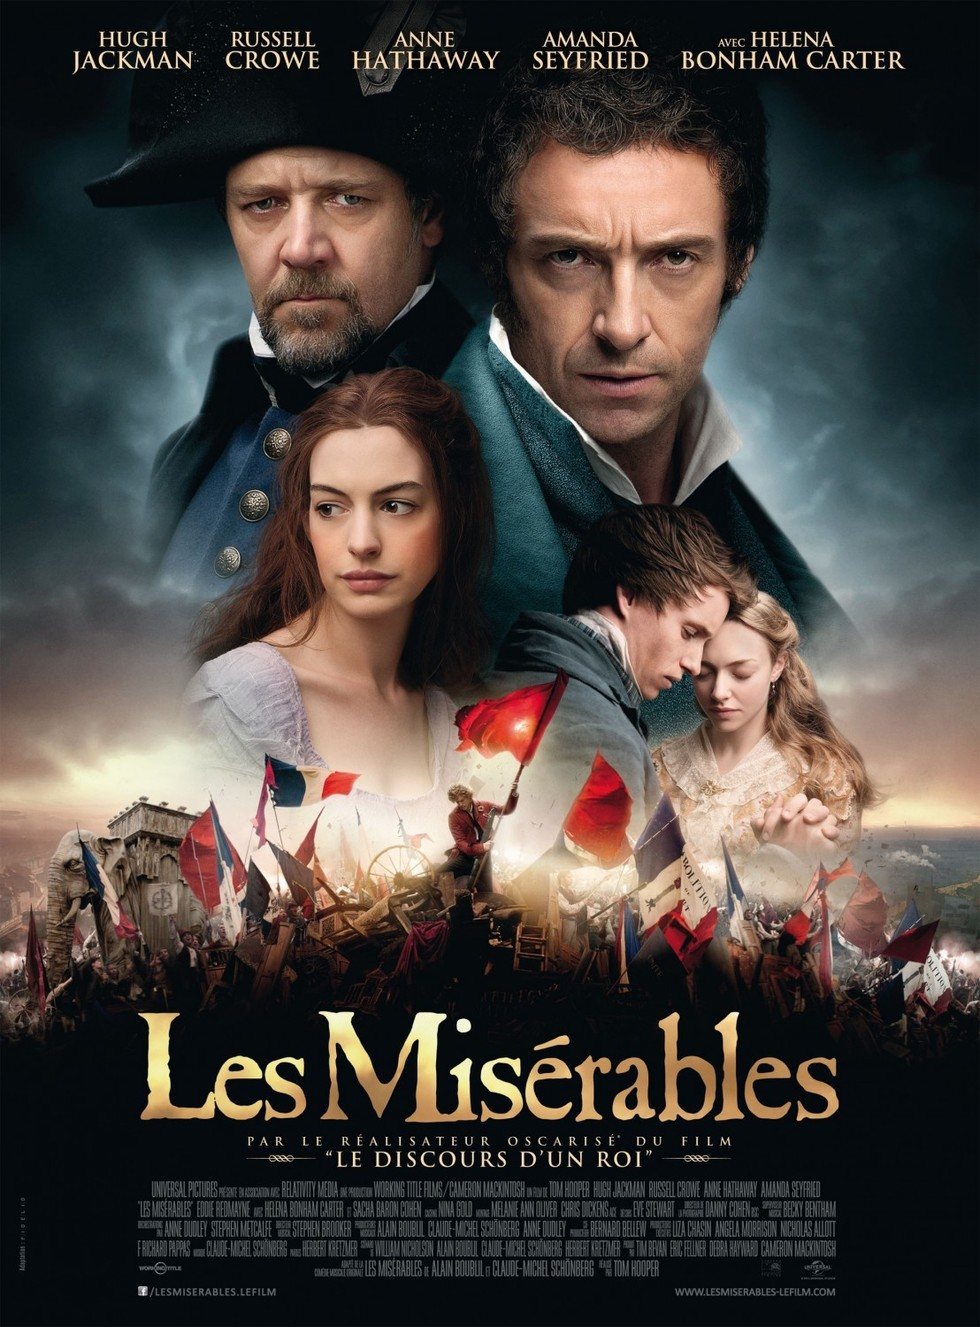 Les Miserables - Movie Poster #3 (Large)